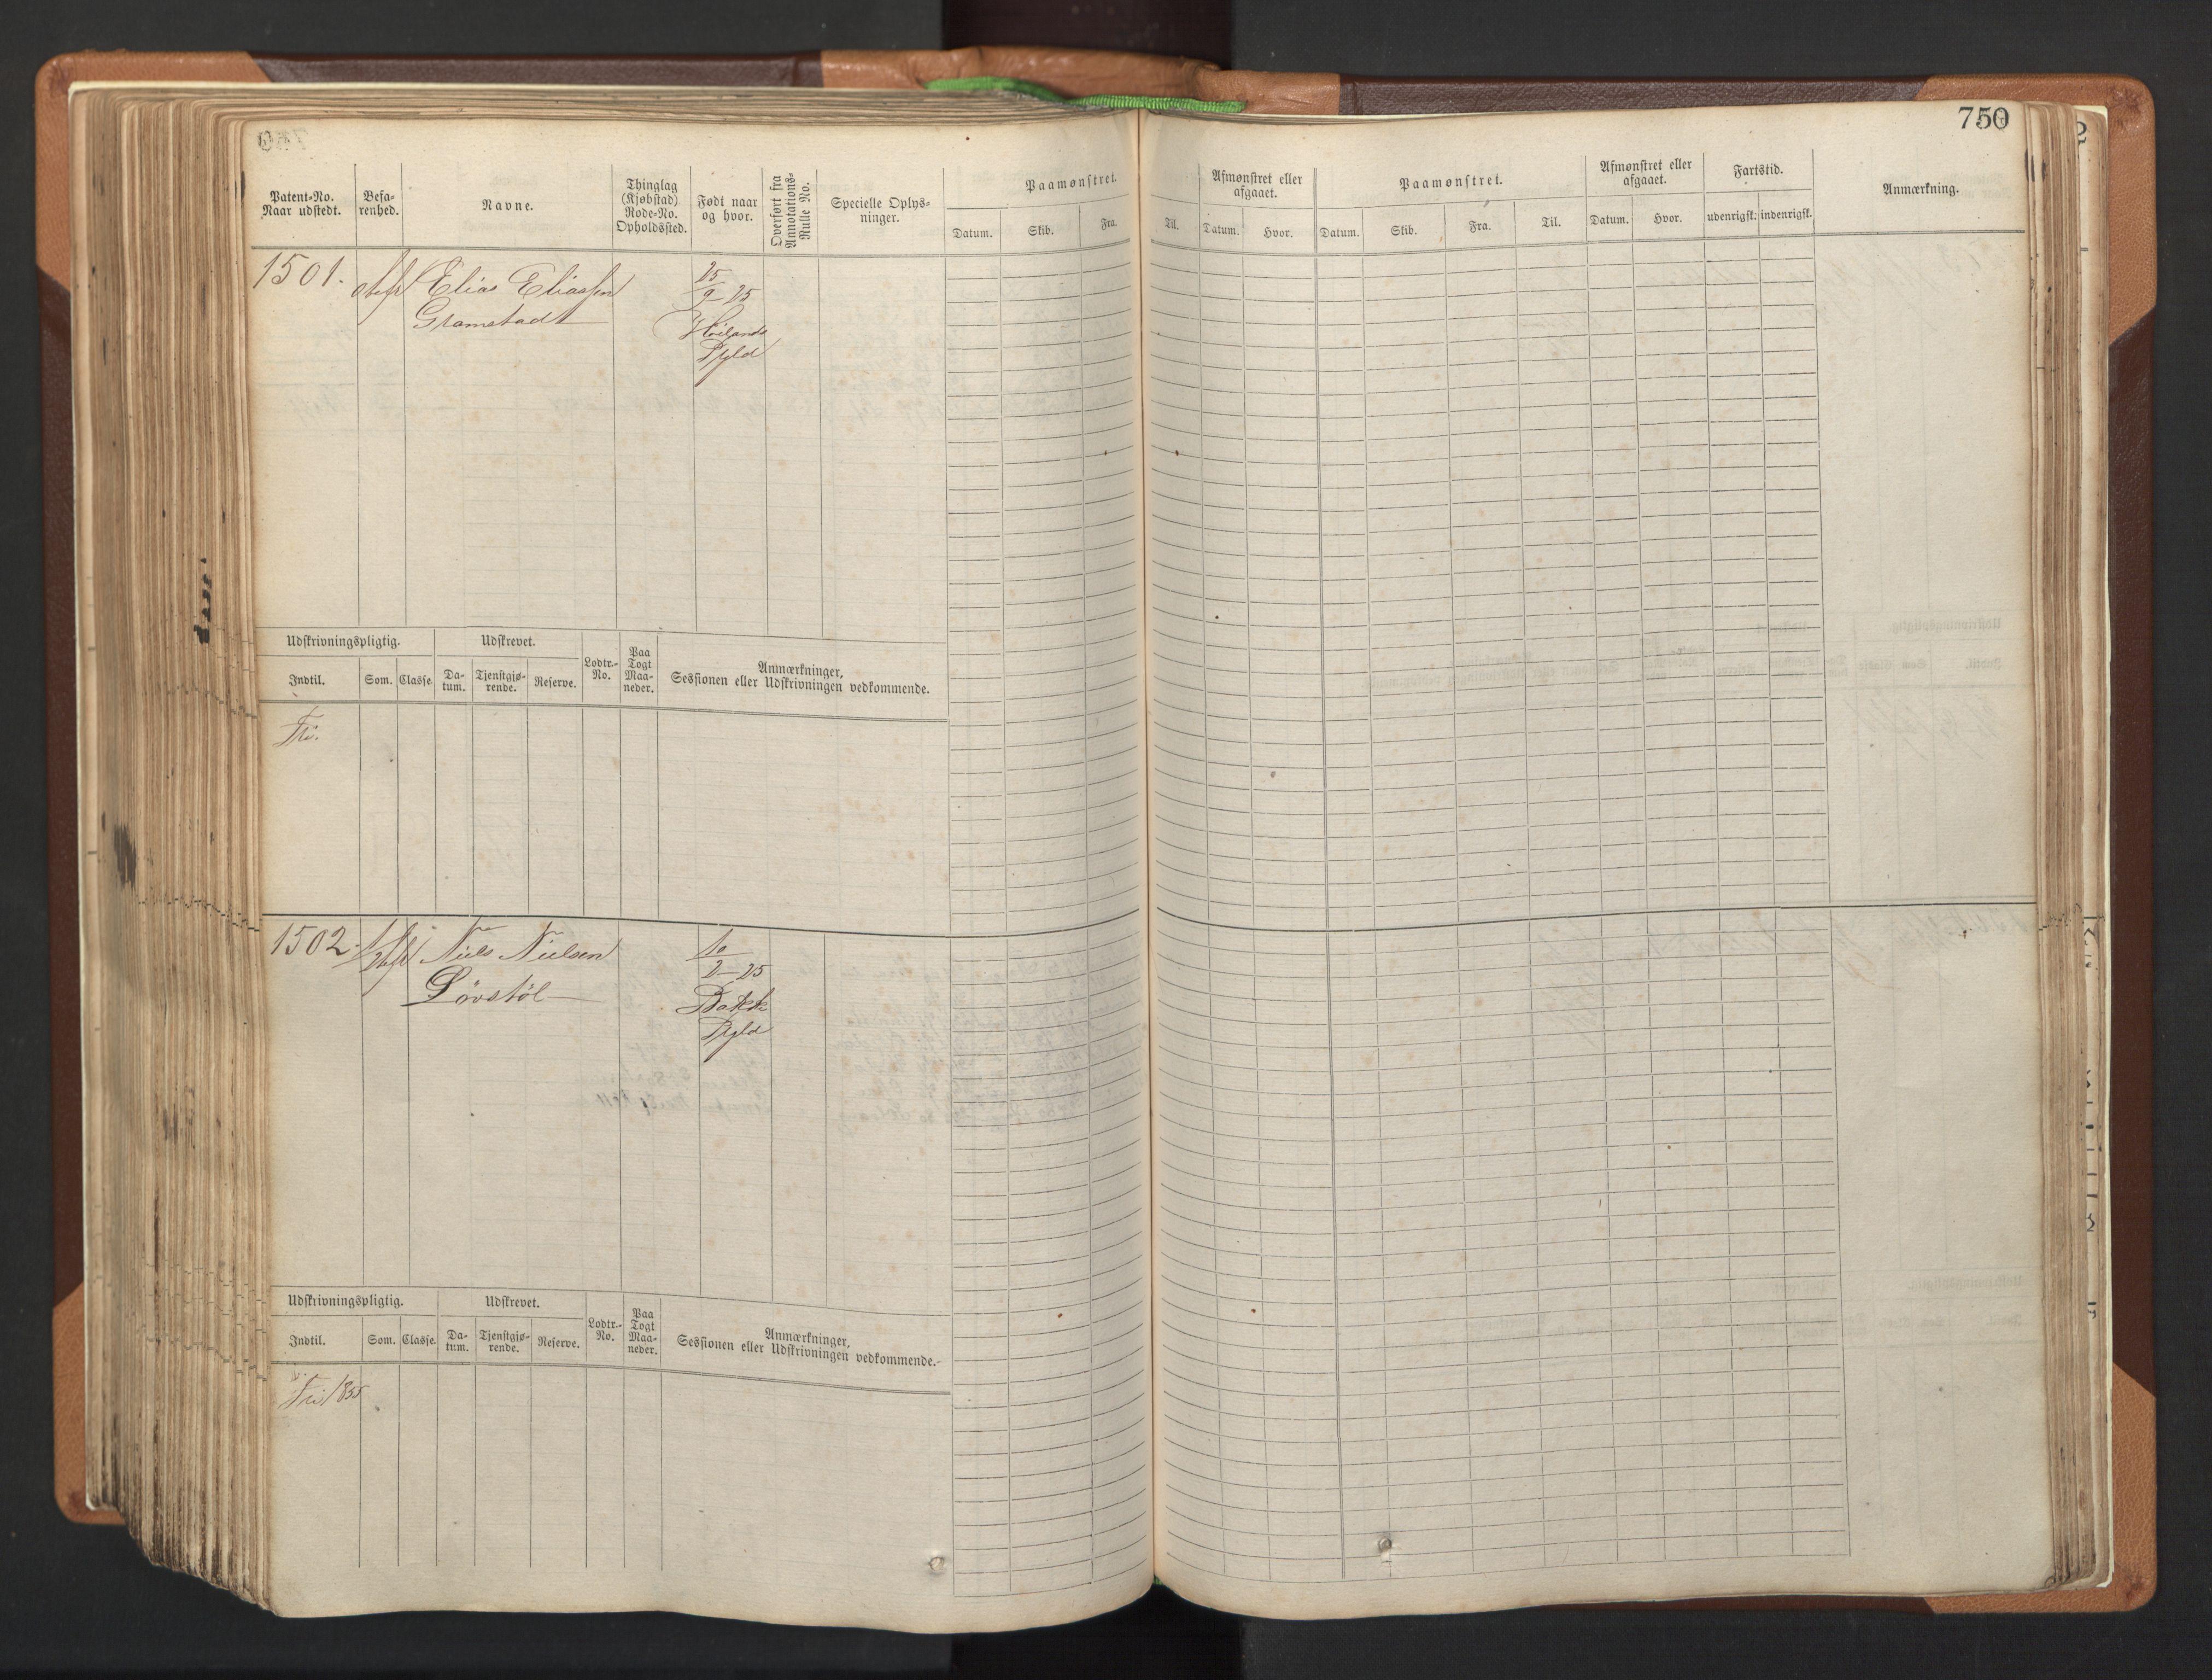 SAST, Stavanger sjømannskontor, F/Fb/Fbb/L0005: Sjøfartshovedrulle, patentnr. 793-1606 (del 2), 1869-1880, s. 362